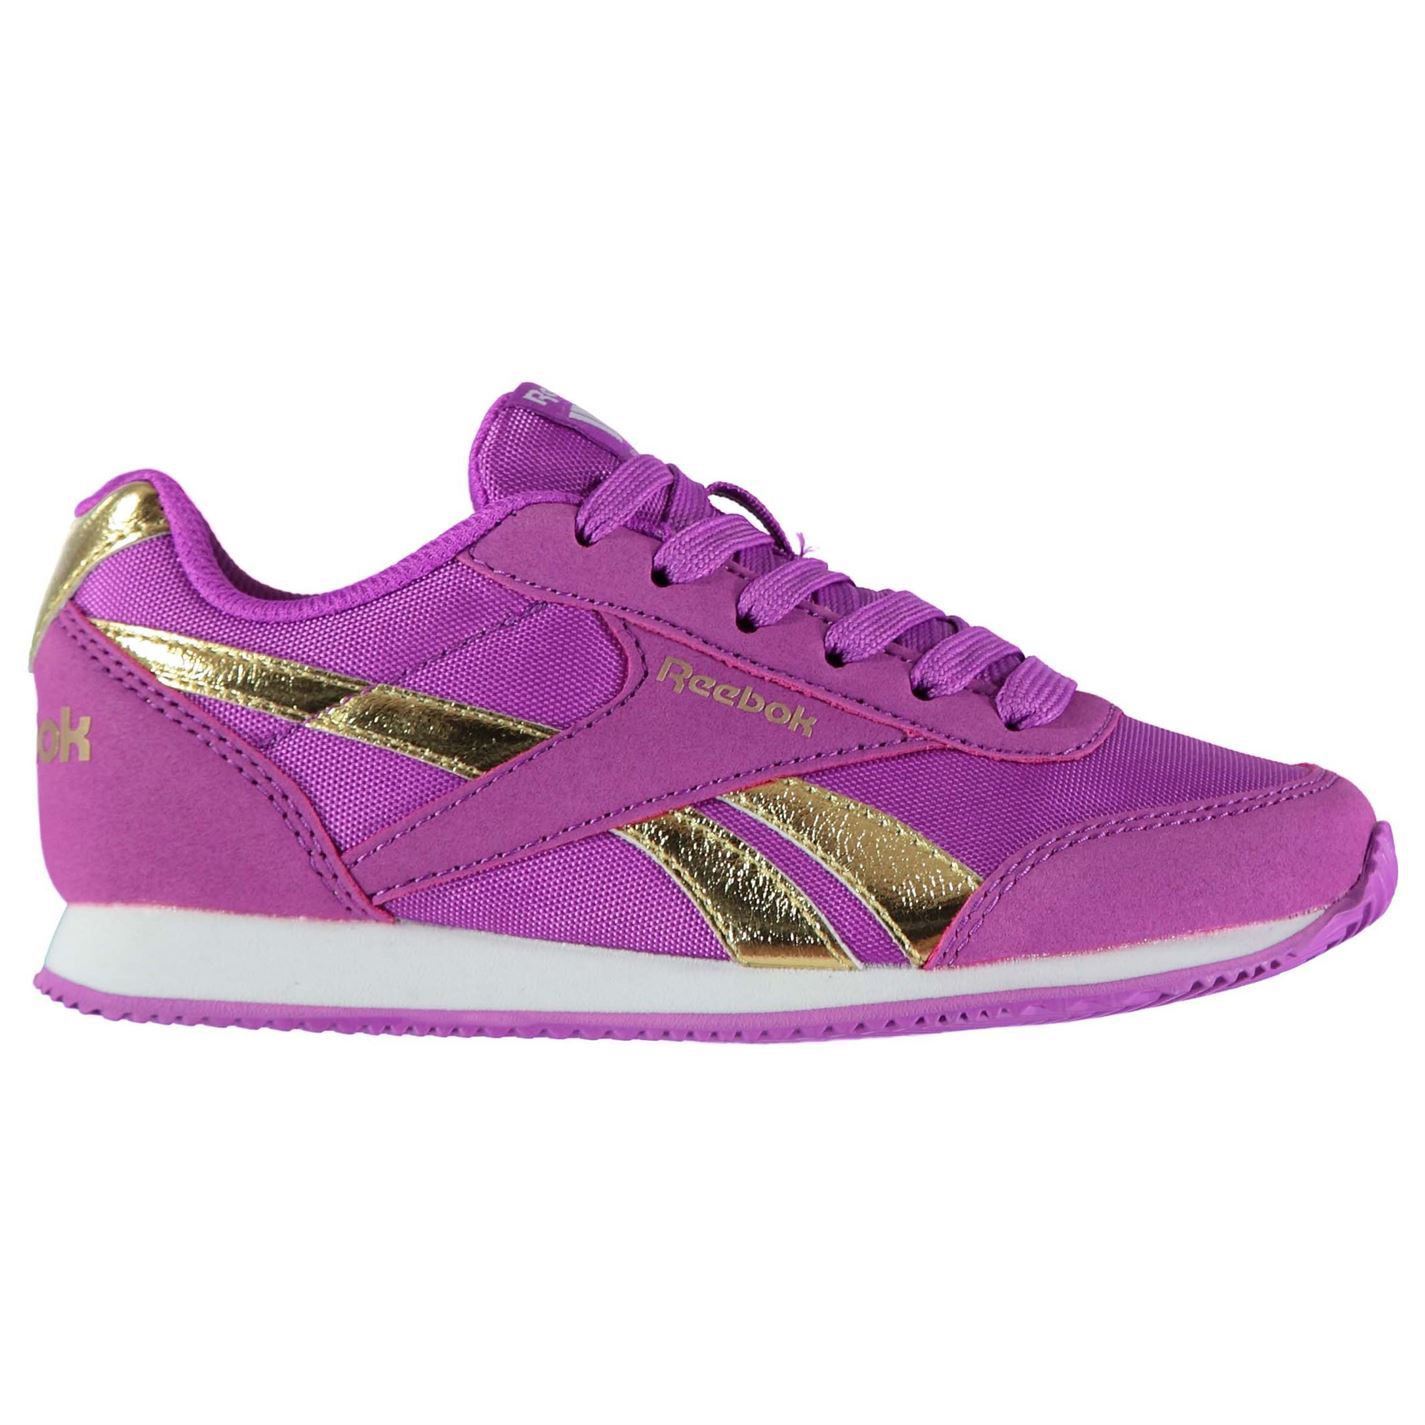 Ragazze-Reebok-Classic-Jogger-RS-Kids-Sneakers-lacci-Tessile-Ortholite